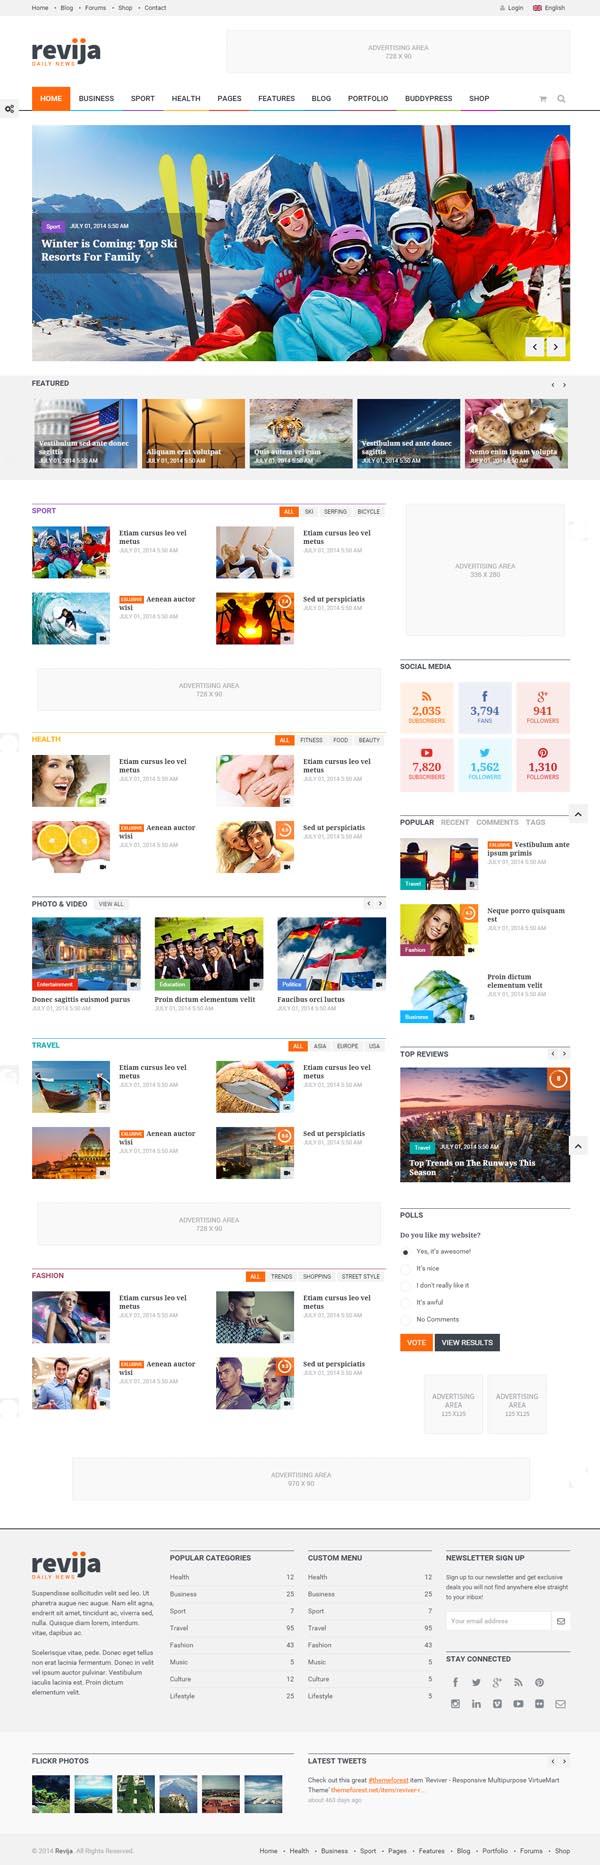 Revija – Premium Blog/Magazine HTML Template